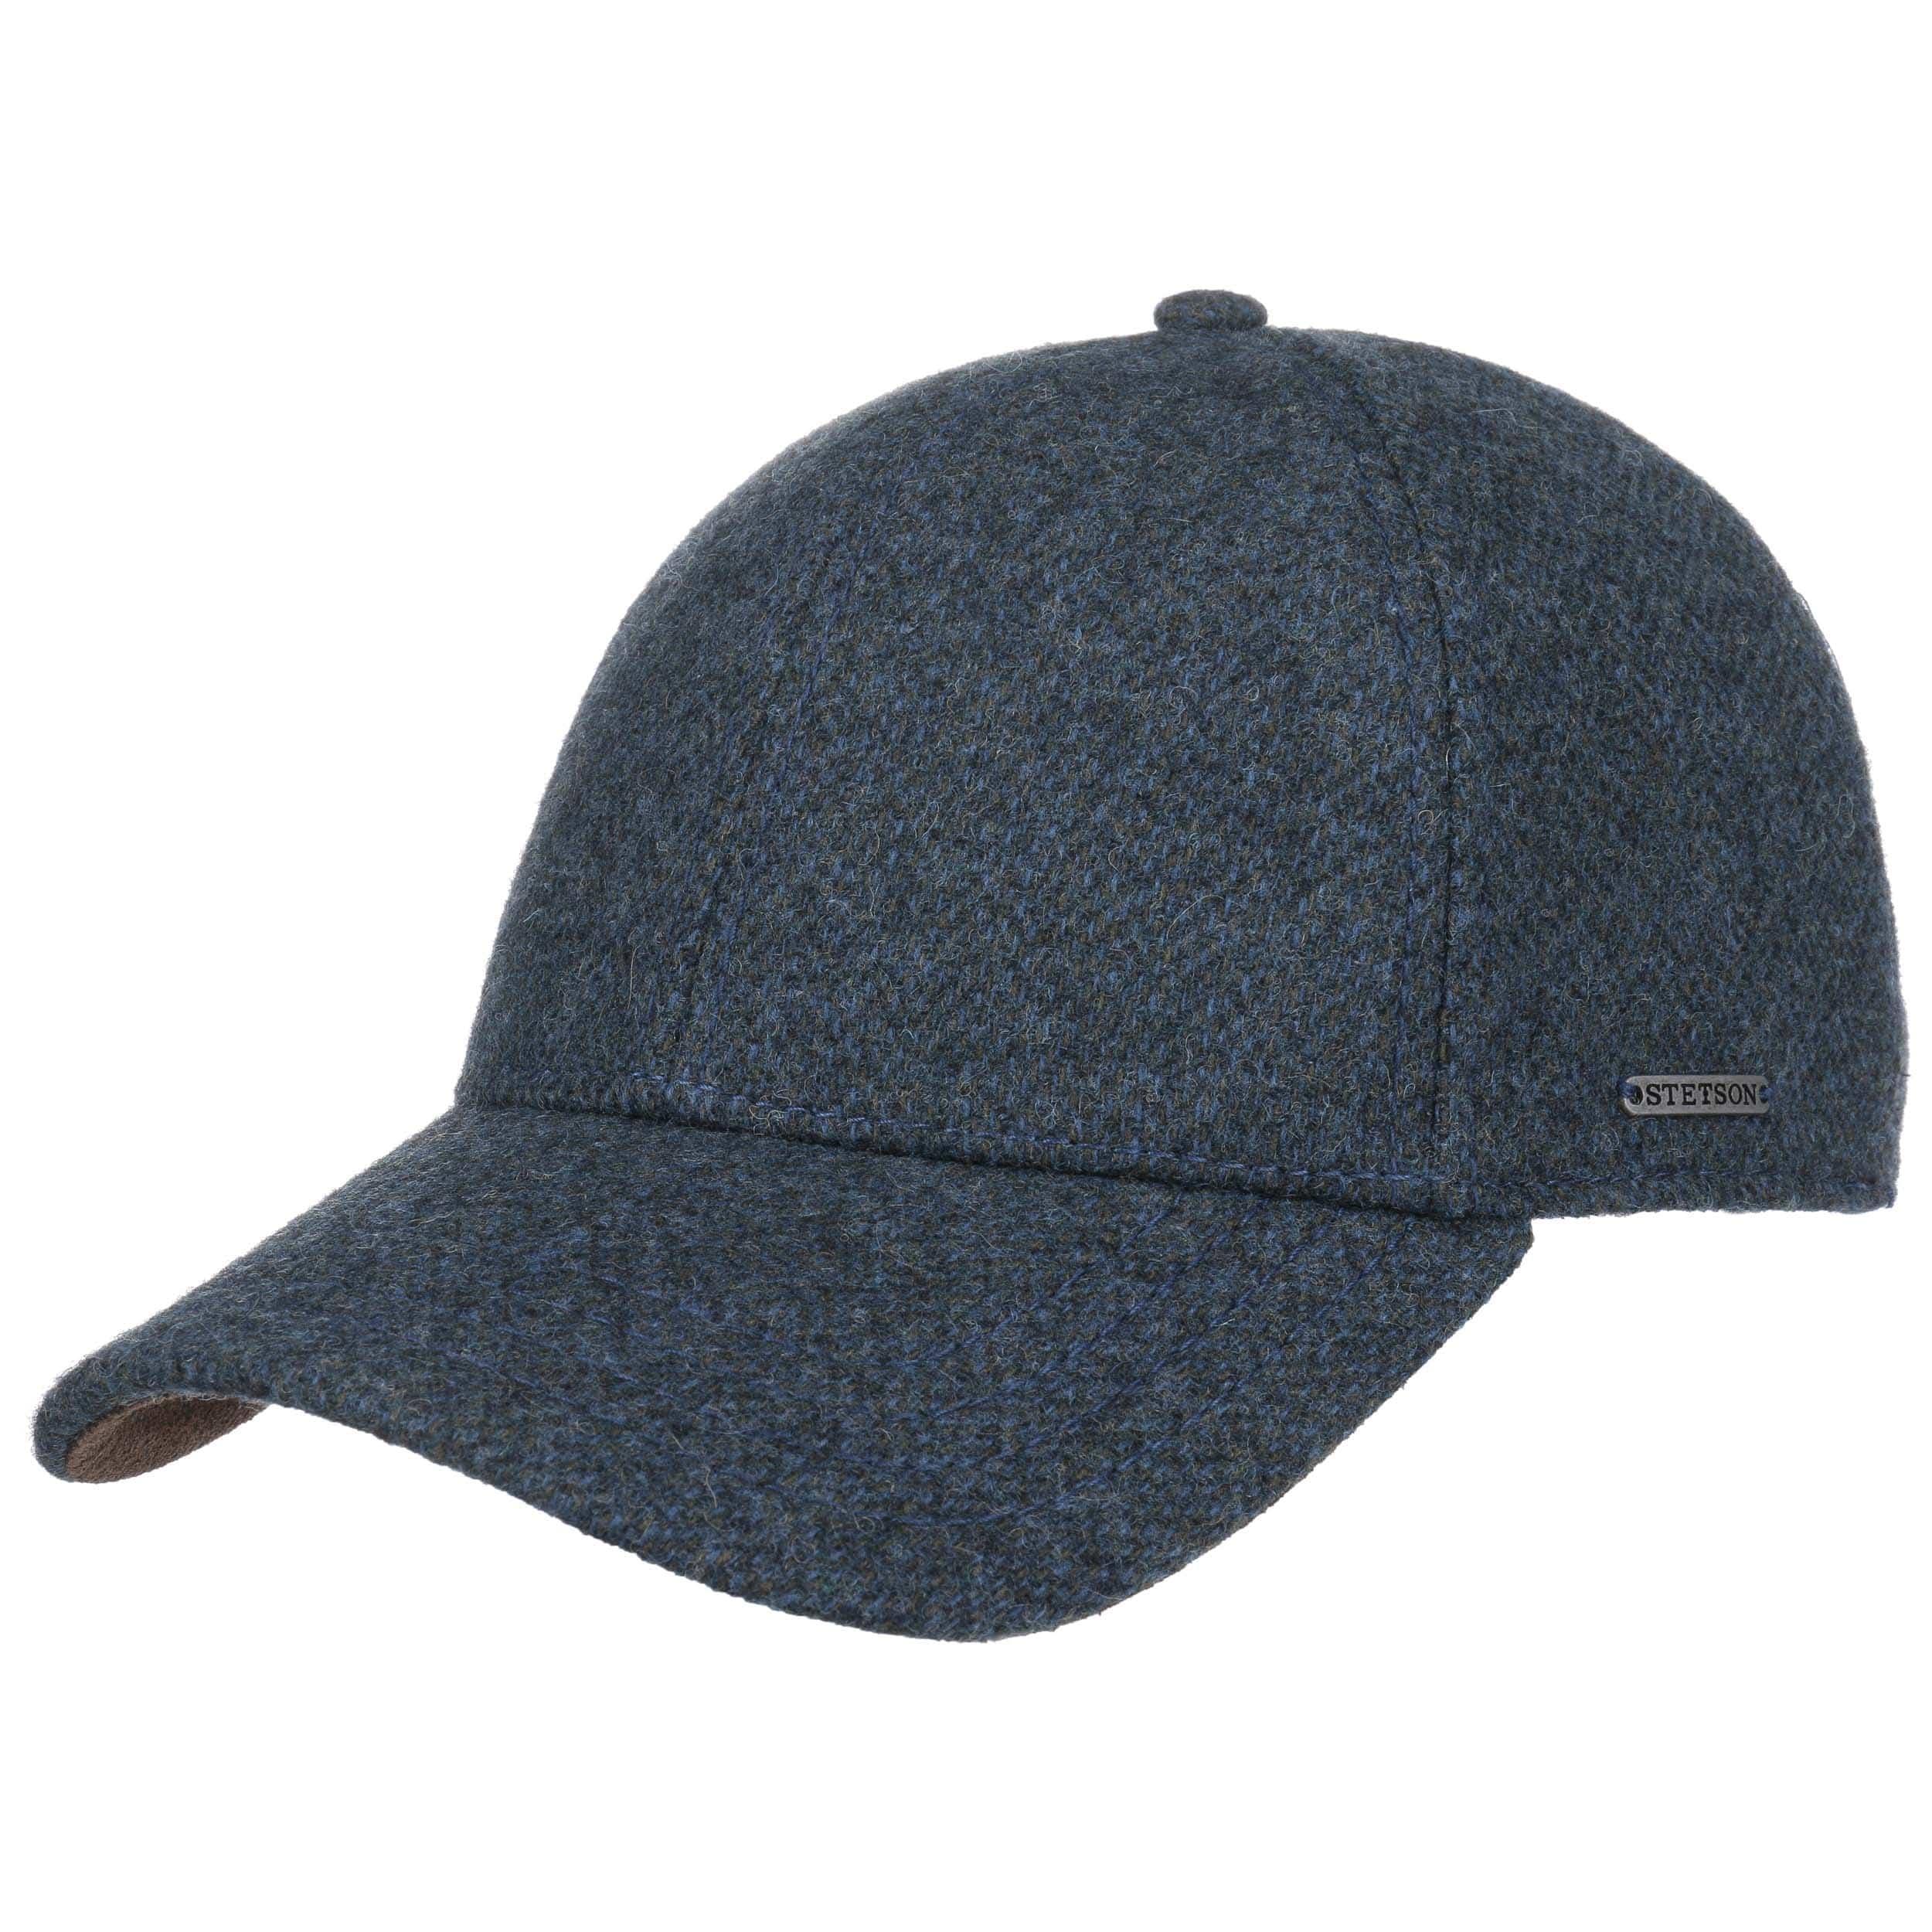 Plano Woolrich Cap by Stetson e8b9e250514a